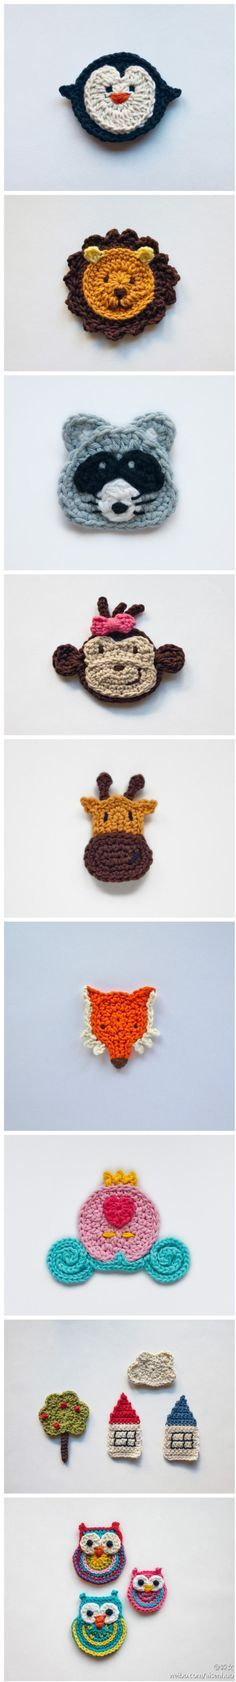 crocheted heads